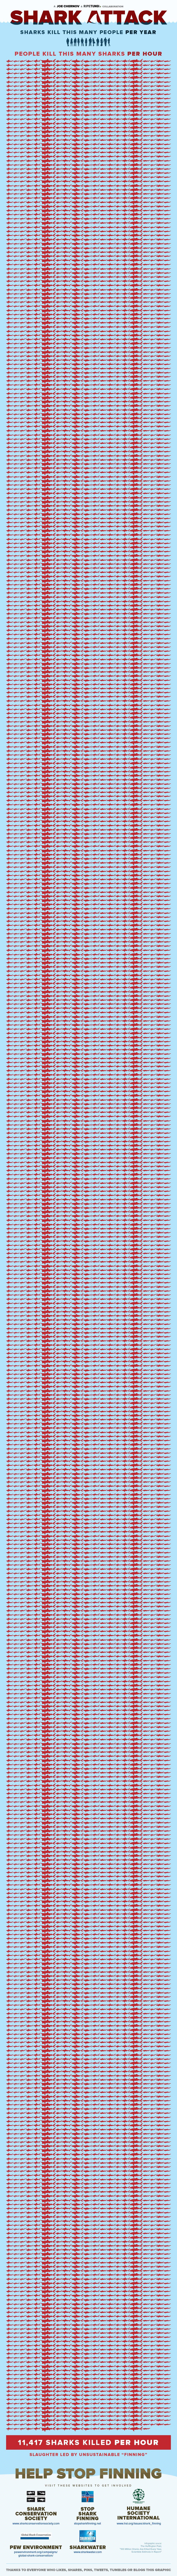 Shark Attack - Stop Finning Infografik - Klicken für größer